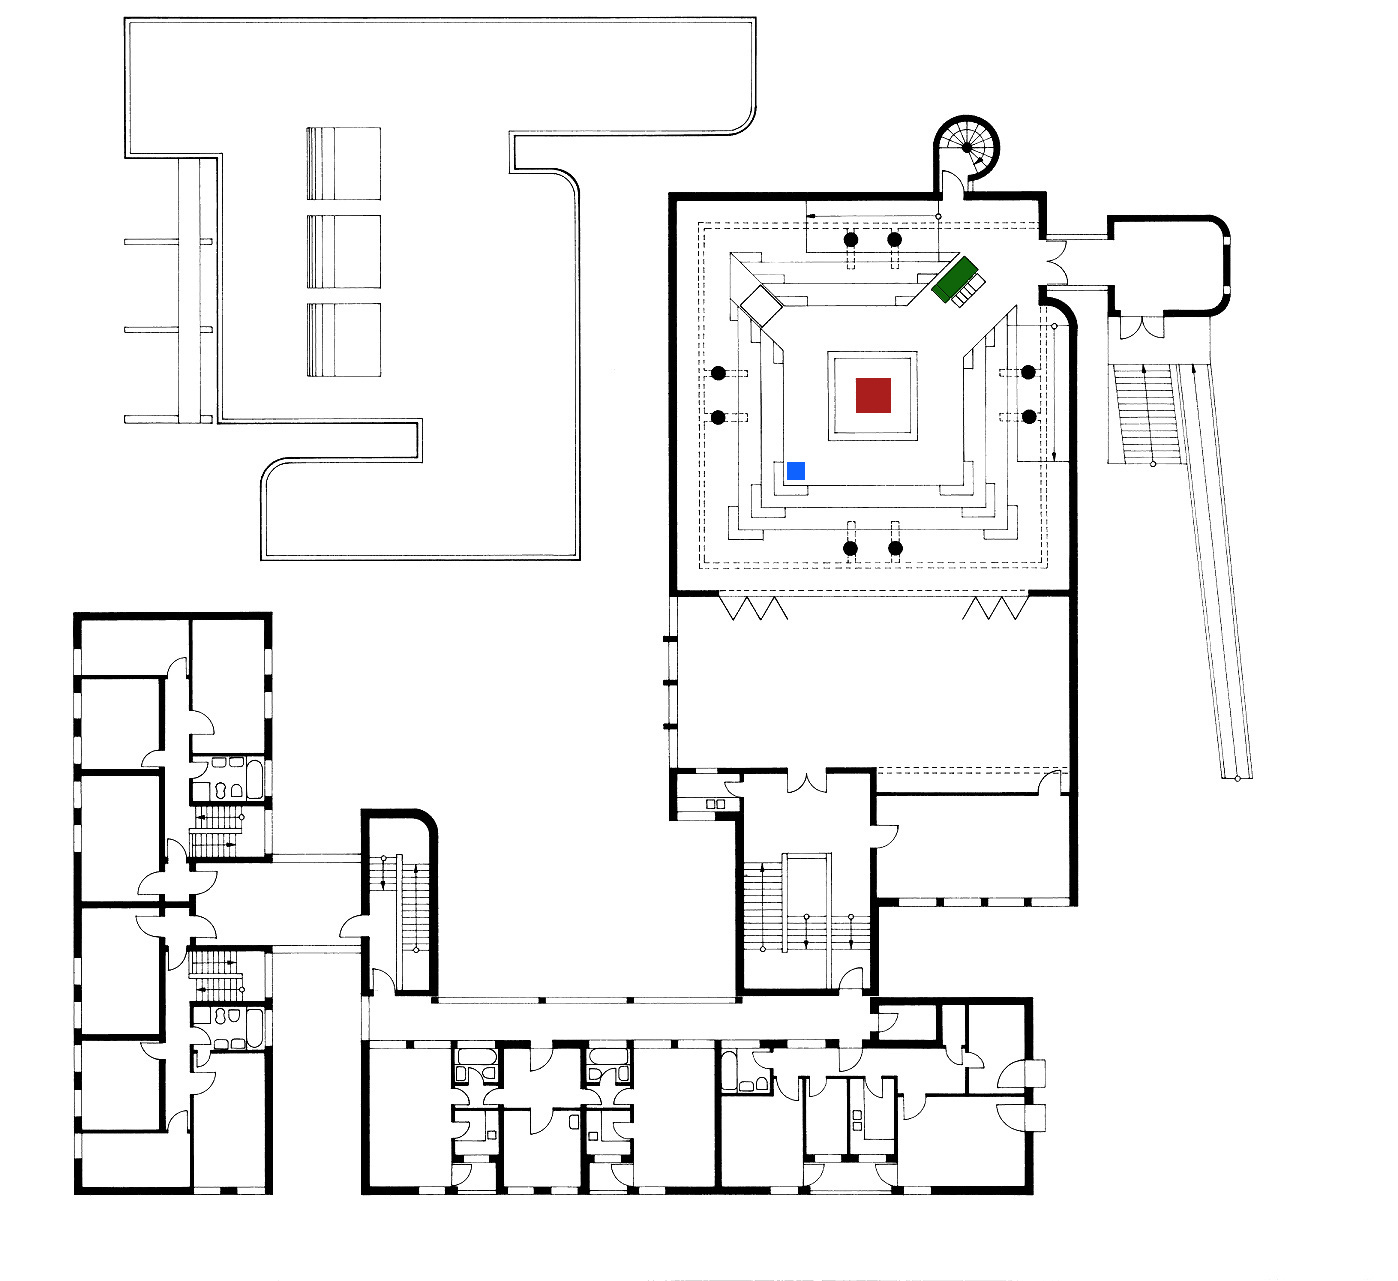 Berlin | Gemeindezentrum Plötzensee | Grundriss (bearbeitet) | Foto: Architekturmuseum, TU Berlin, Inv.-Nr. NGP 0043-0119-2